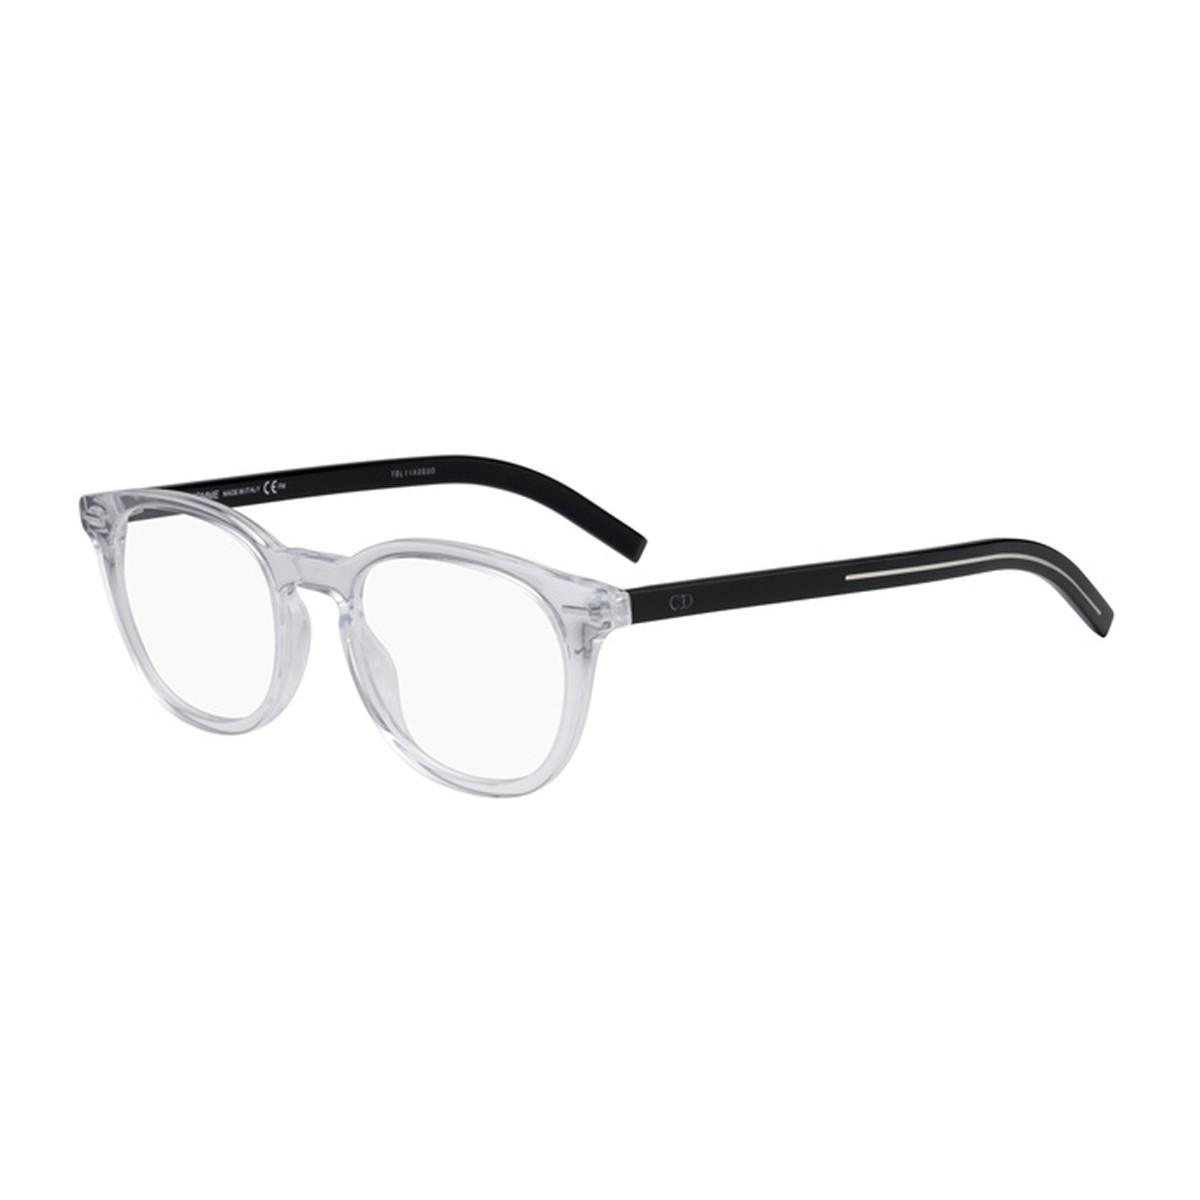 Dior Blacktie 238 | Occhiali da vista Uomo